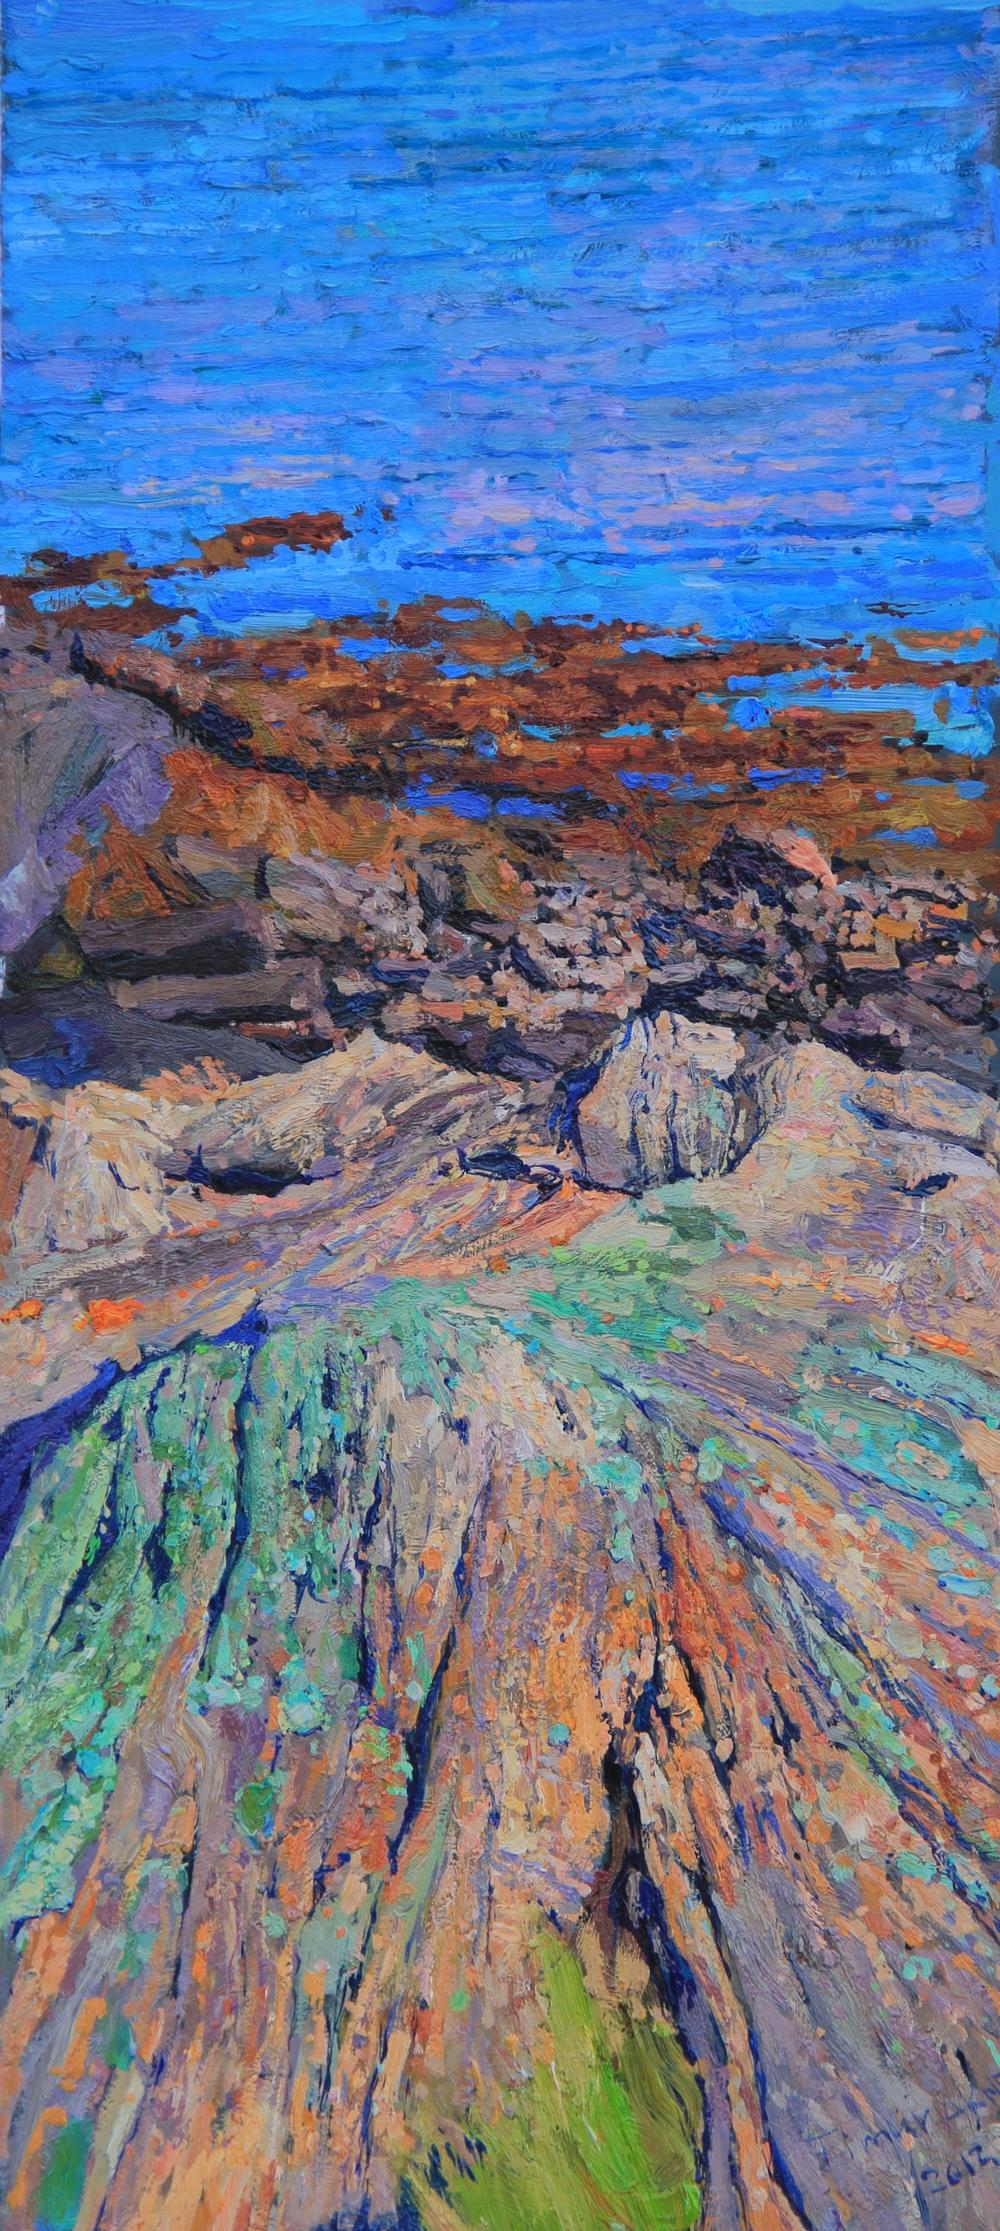 Timur Akhriev  Title: Dragon Point, Westport Island ME  10'' x 22''Oil on Board, 2012. Sold Through: Gallery Russia.